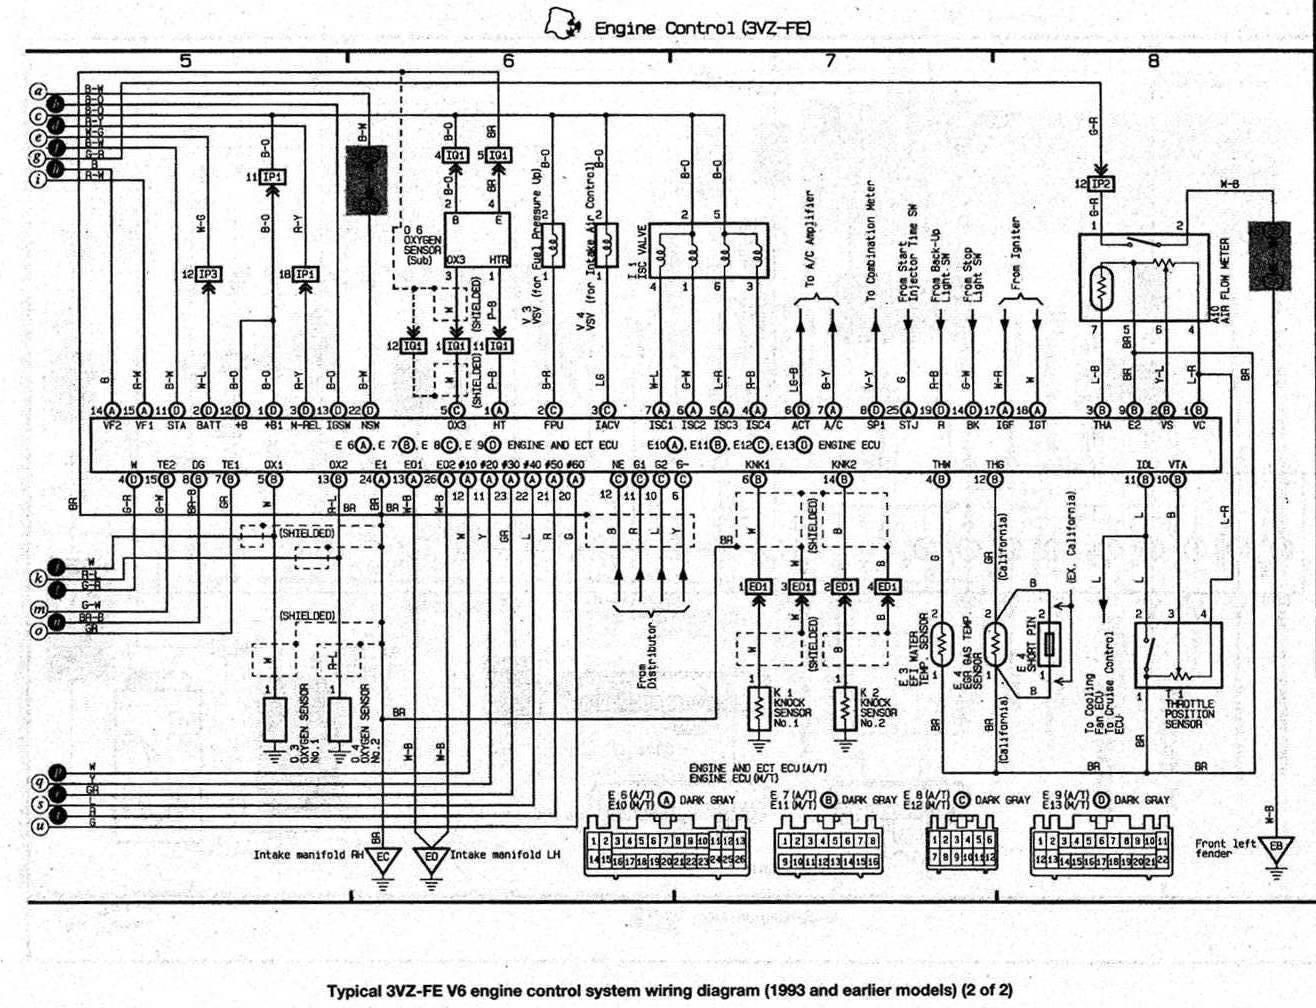 es300 92 injectors  2 and  5 no ground pulse